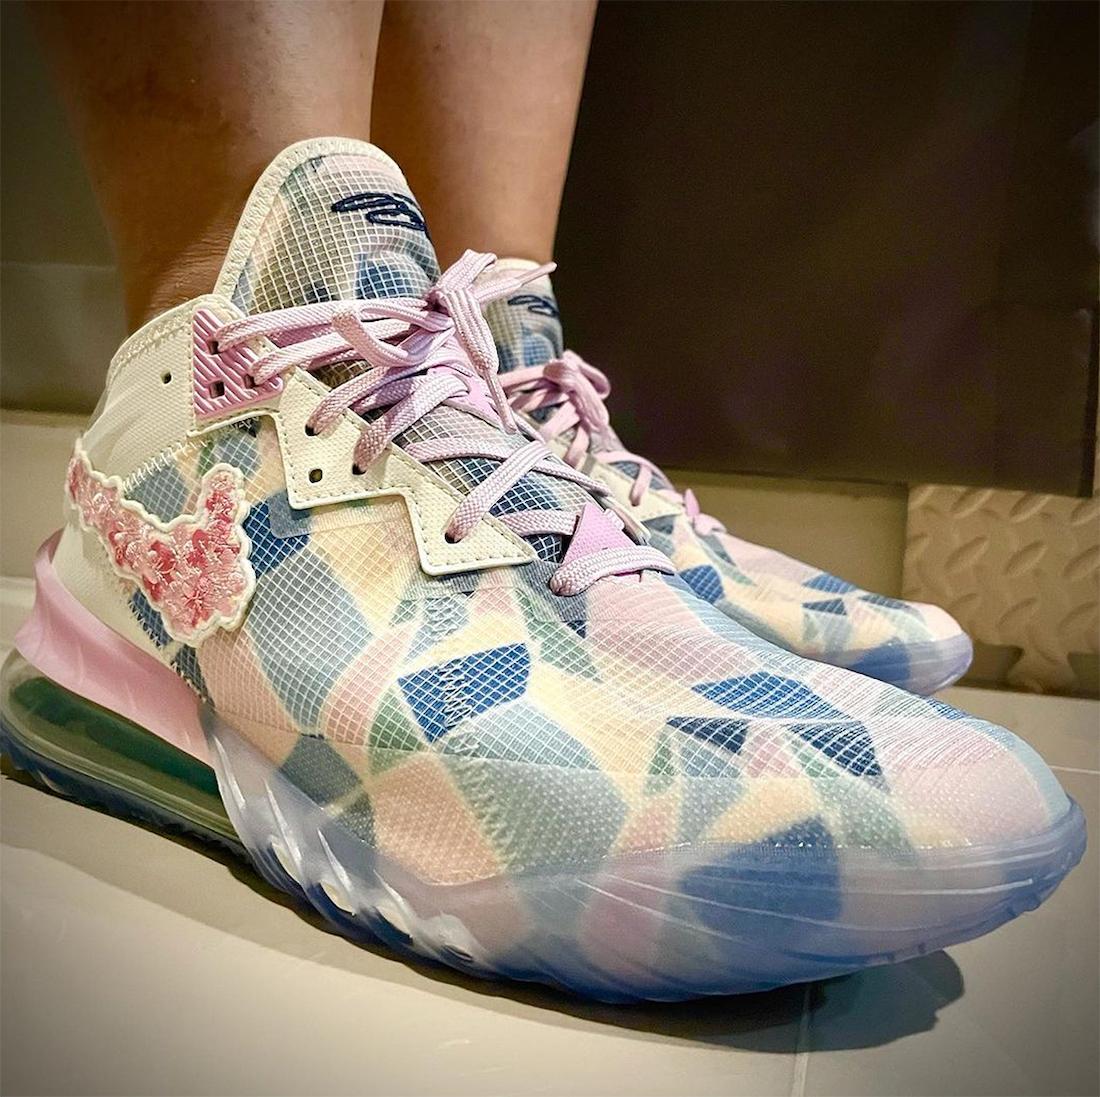 atmos Nike LeBron 18 Low Sakura Release Date Info